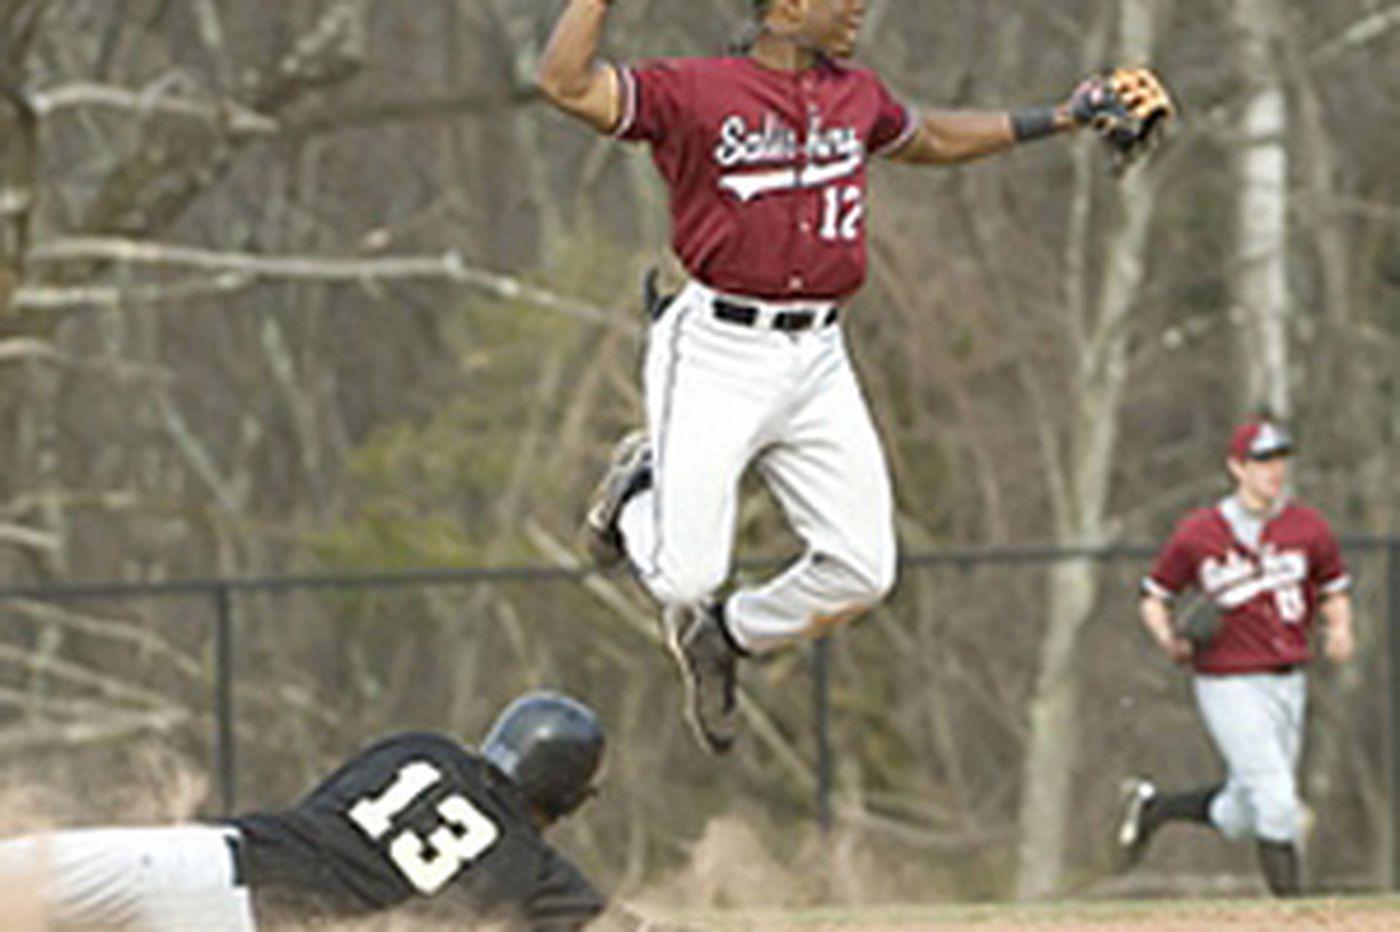 Phillies use top picks on high schoolers